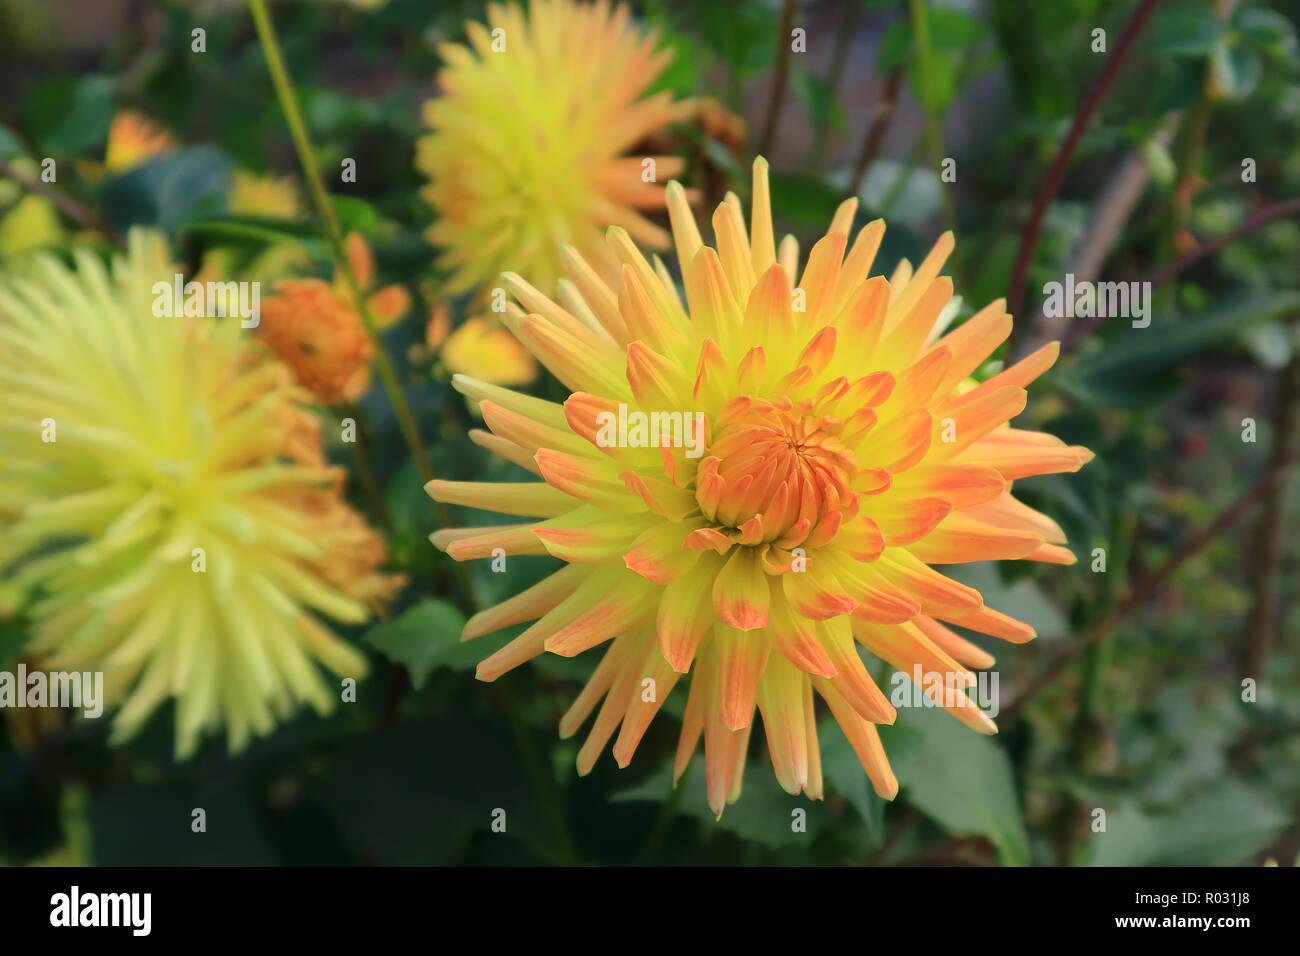 Yellow and Red Semi cactus Dahlia - Stock Image